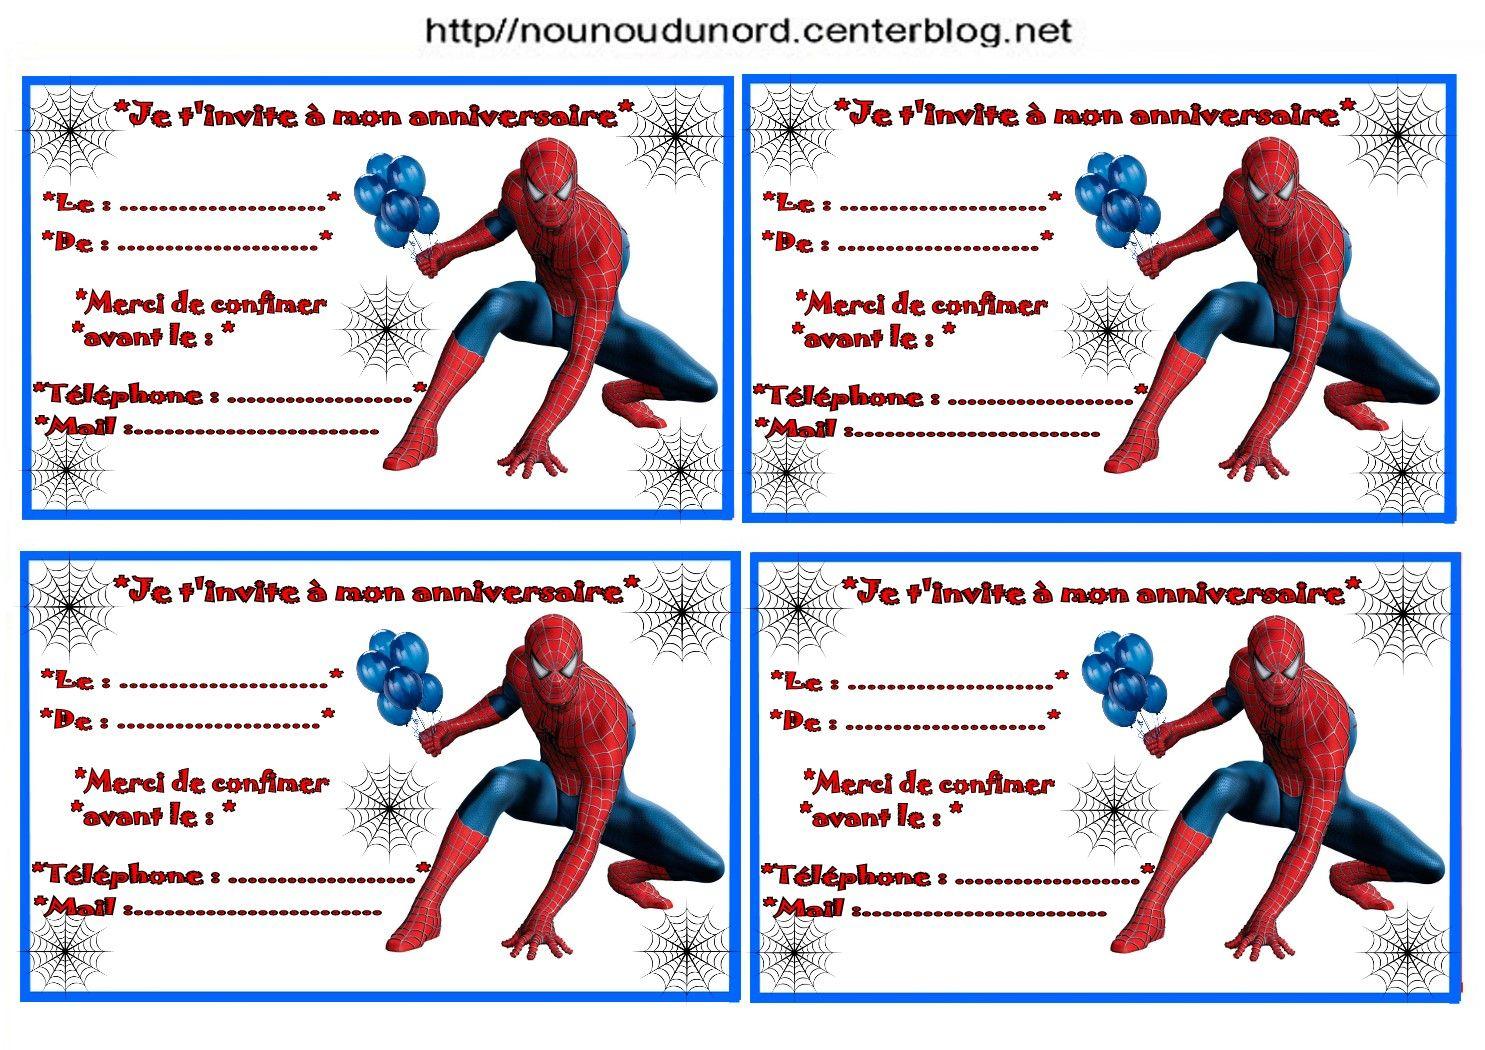 Anniversaire etiquettes invitations spiderman pour http activite anniversaire etiquettes stopboris Choice Image